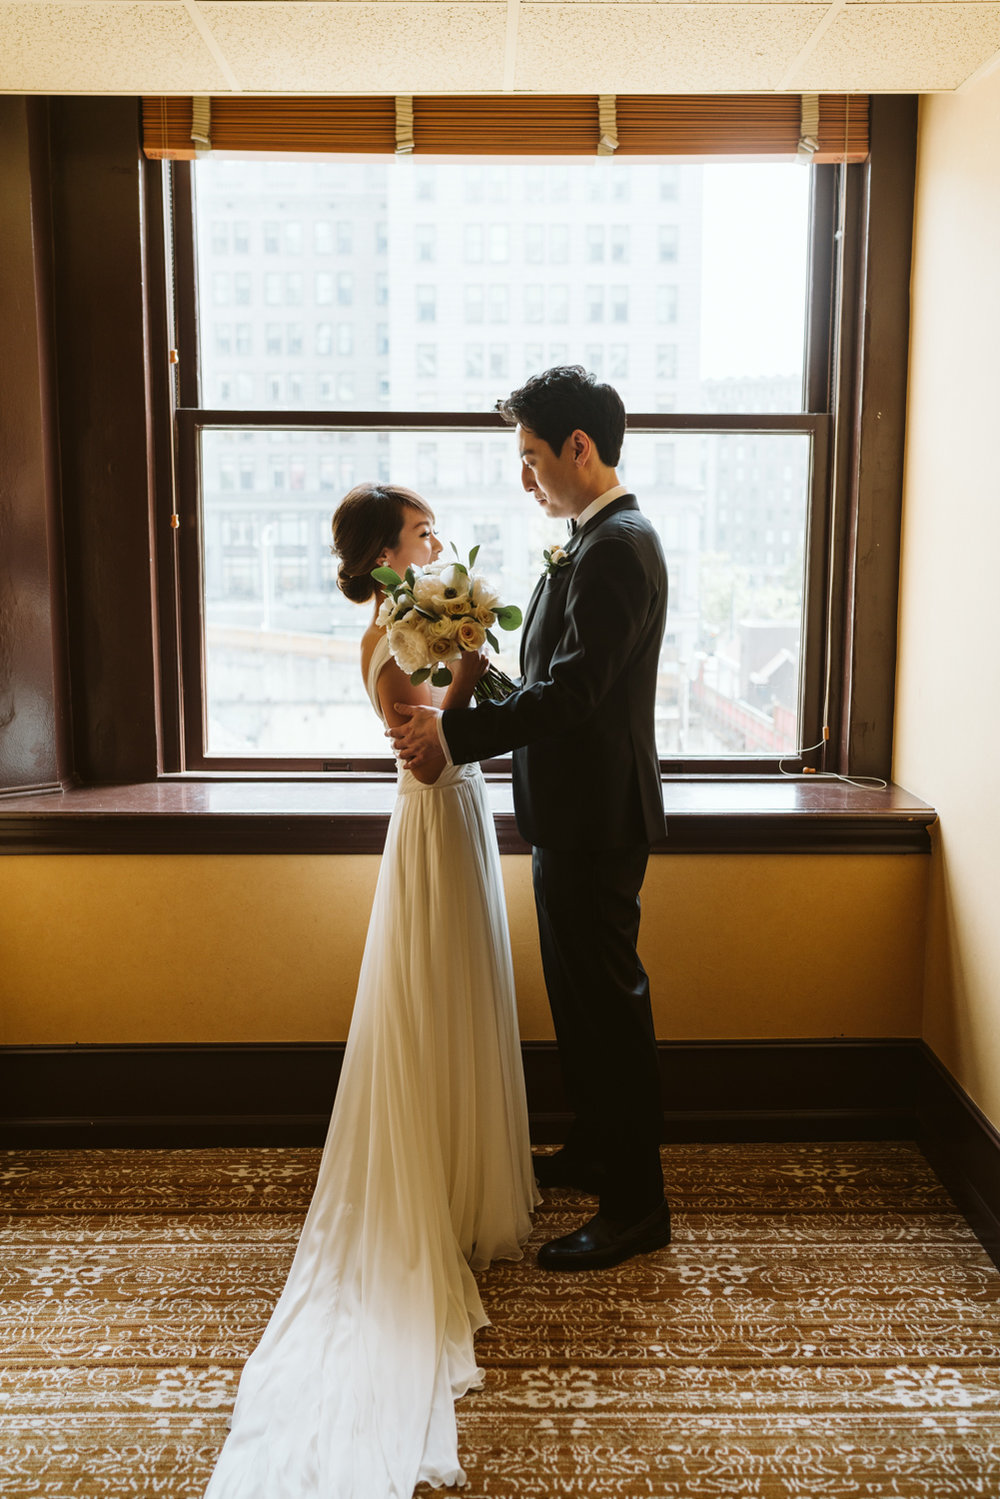 April Yentas Photography - Kristen & Jeff Wedding-13.jpg